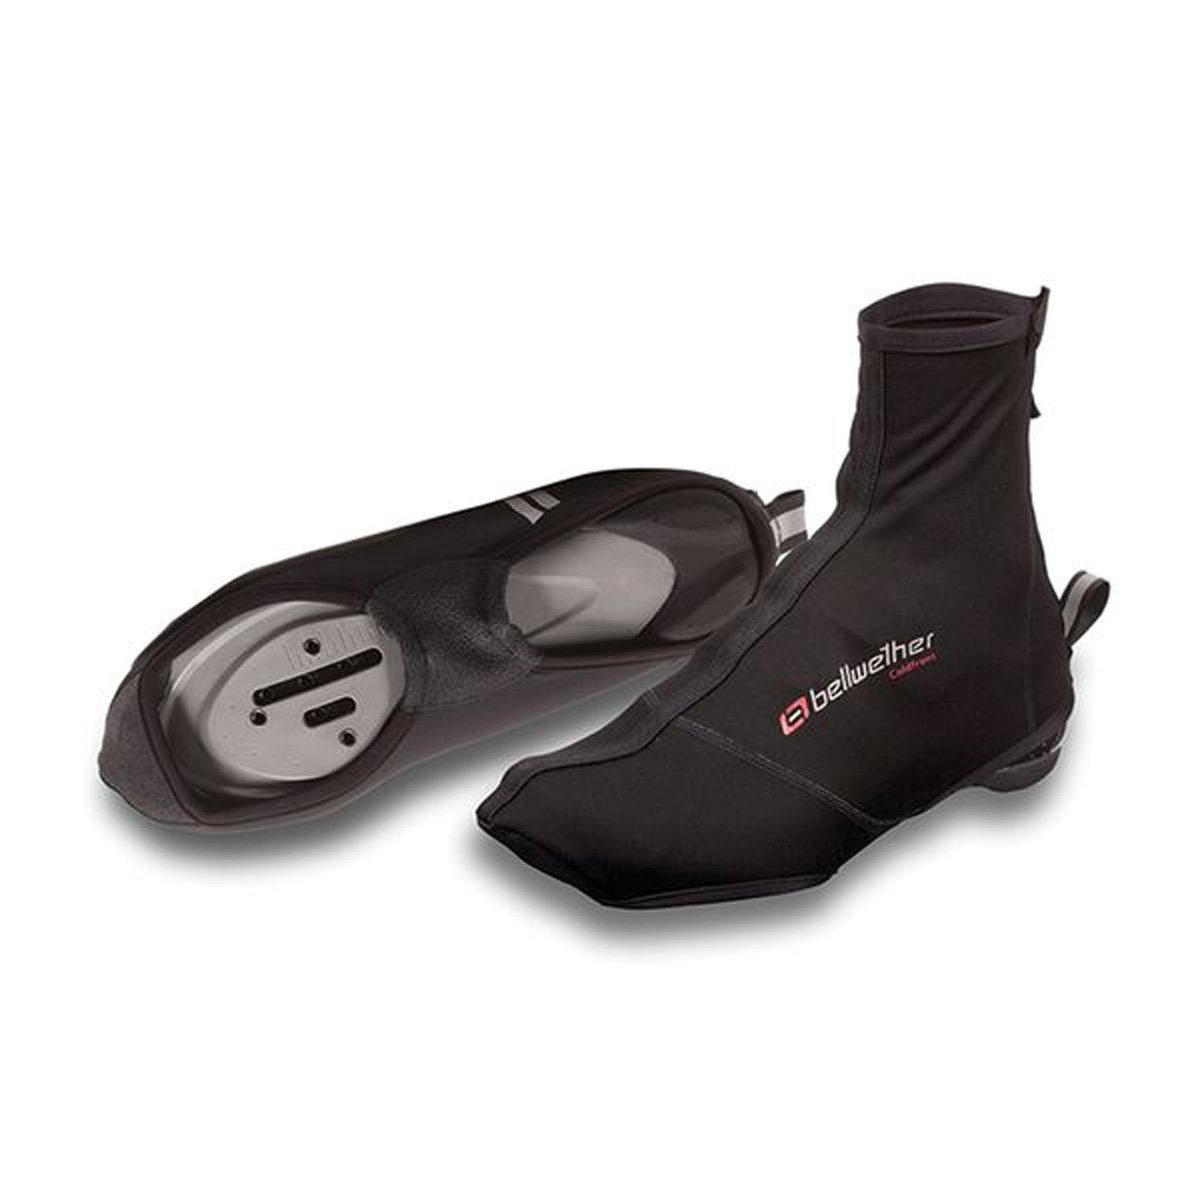 Bellwether 2017 Coldfront Bootieサイクリング靴カバー – 955585 B01J0BQL5W  ブラック Large